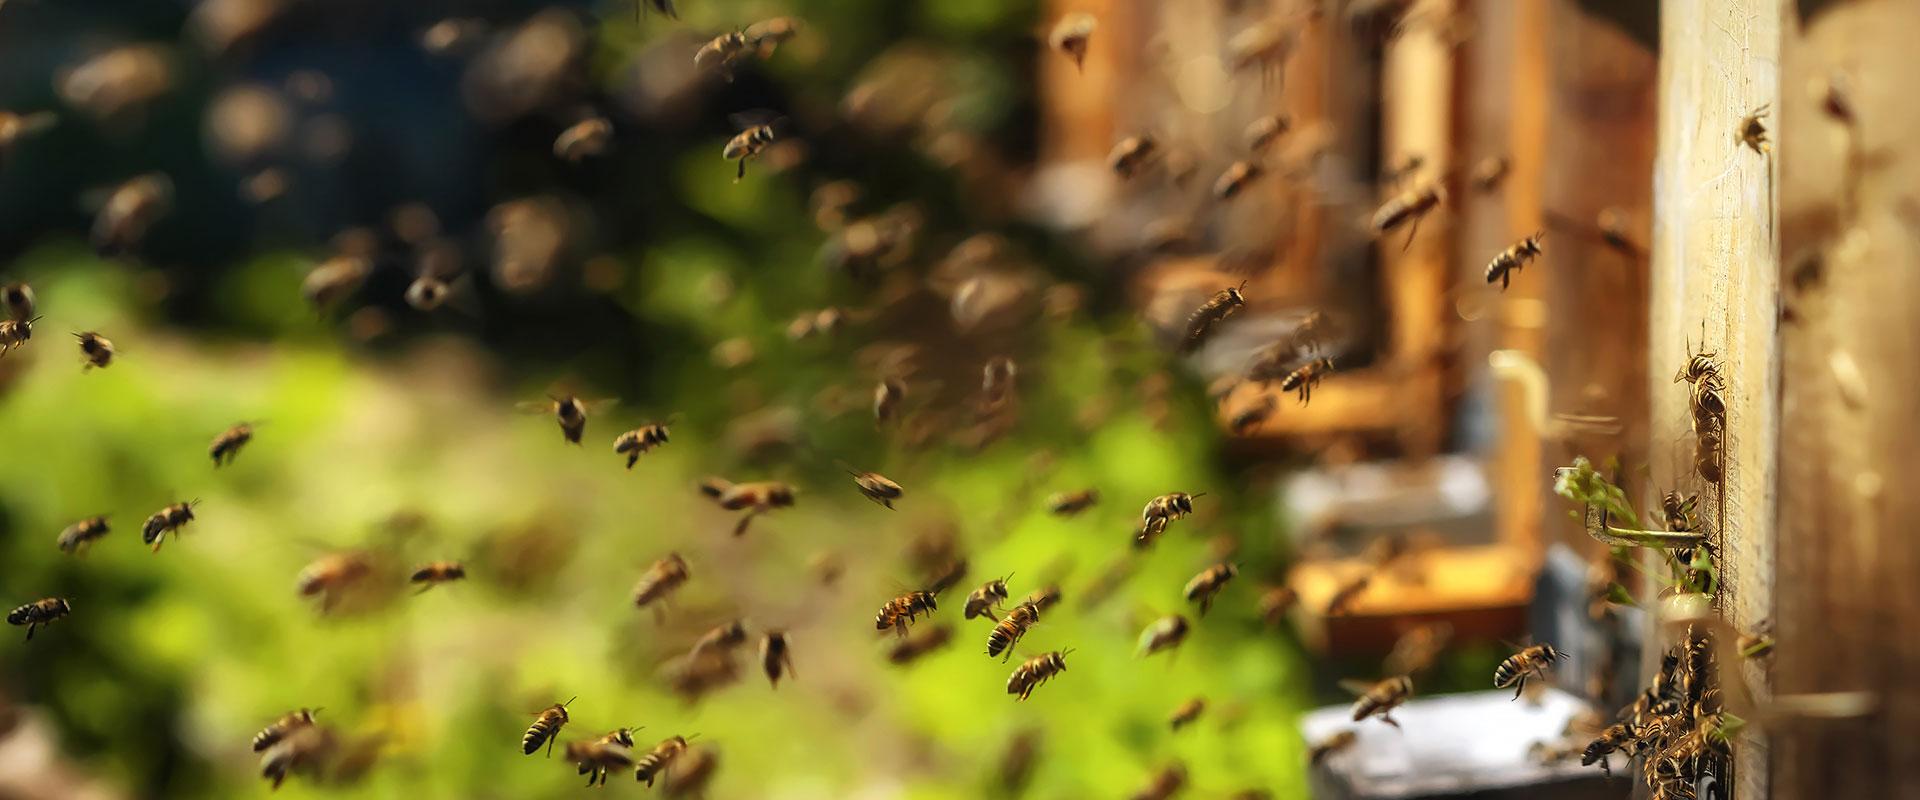 Honey Bees for Sale - Beekeeping Supplies - Bee Well Honey ...